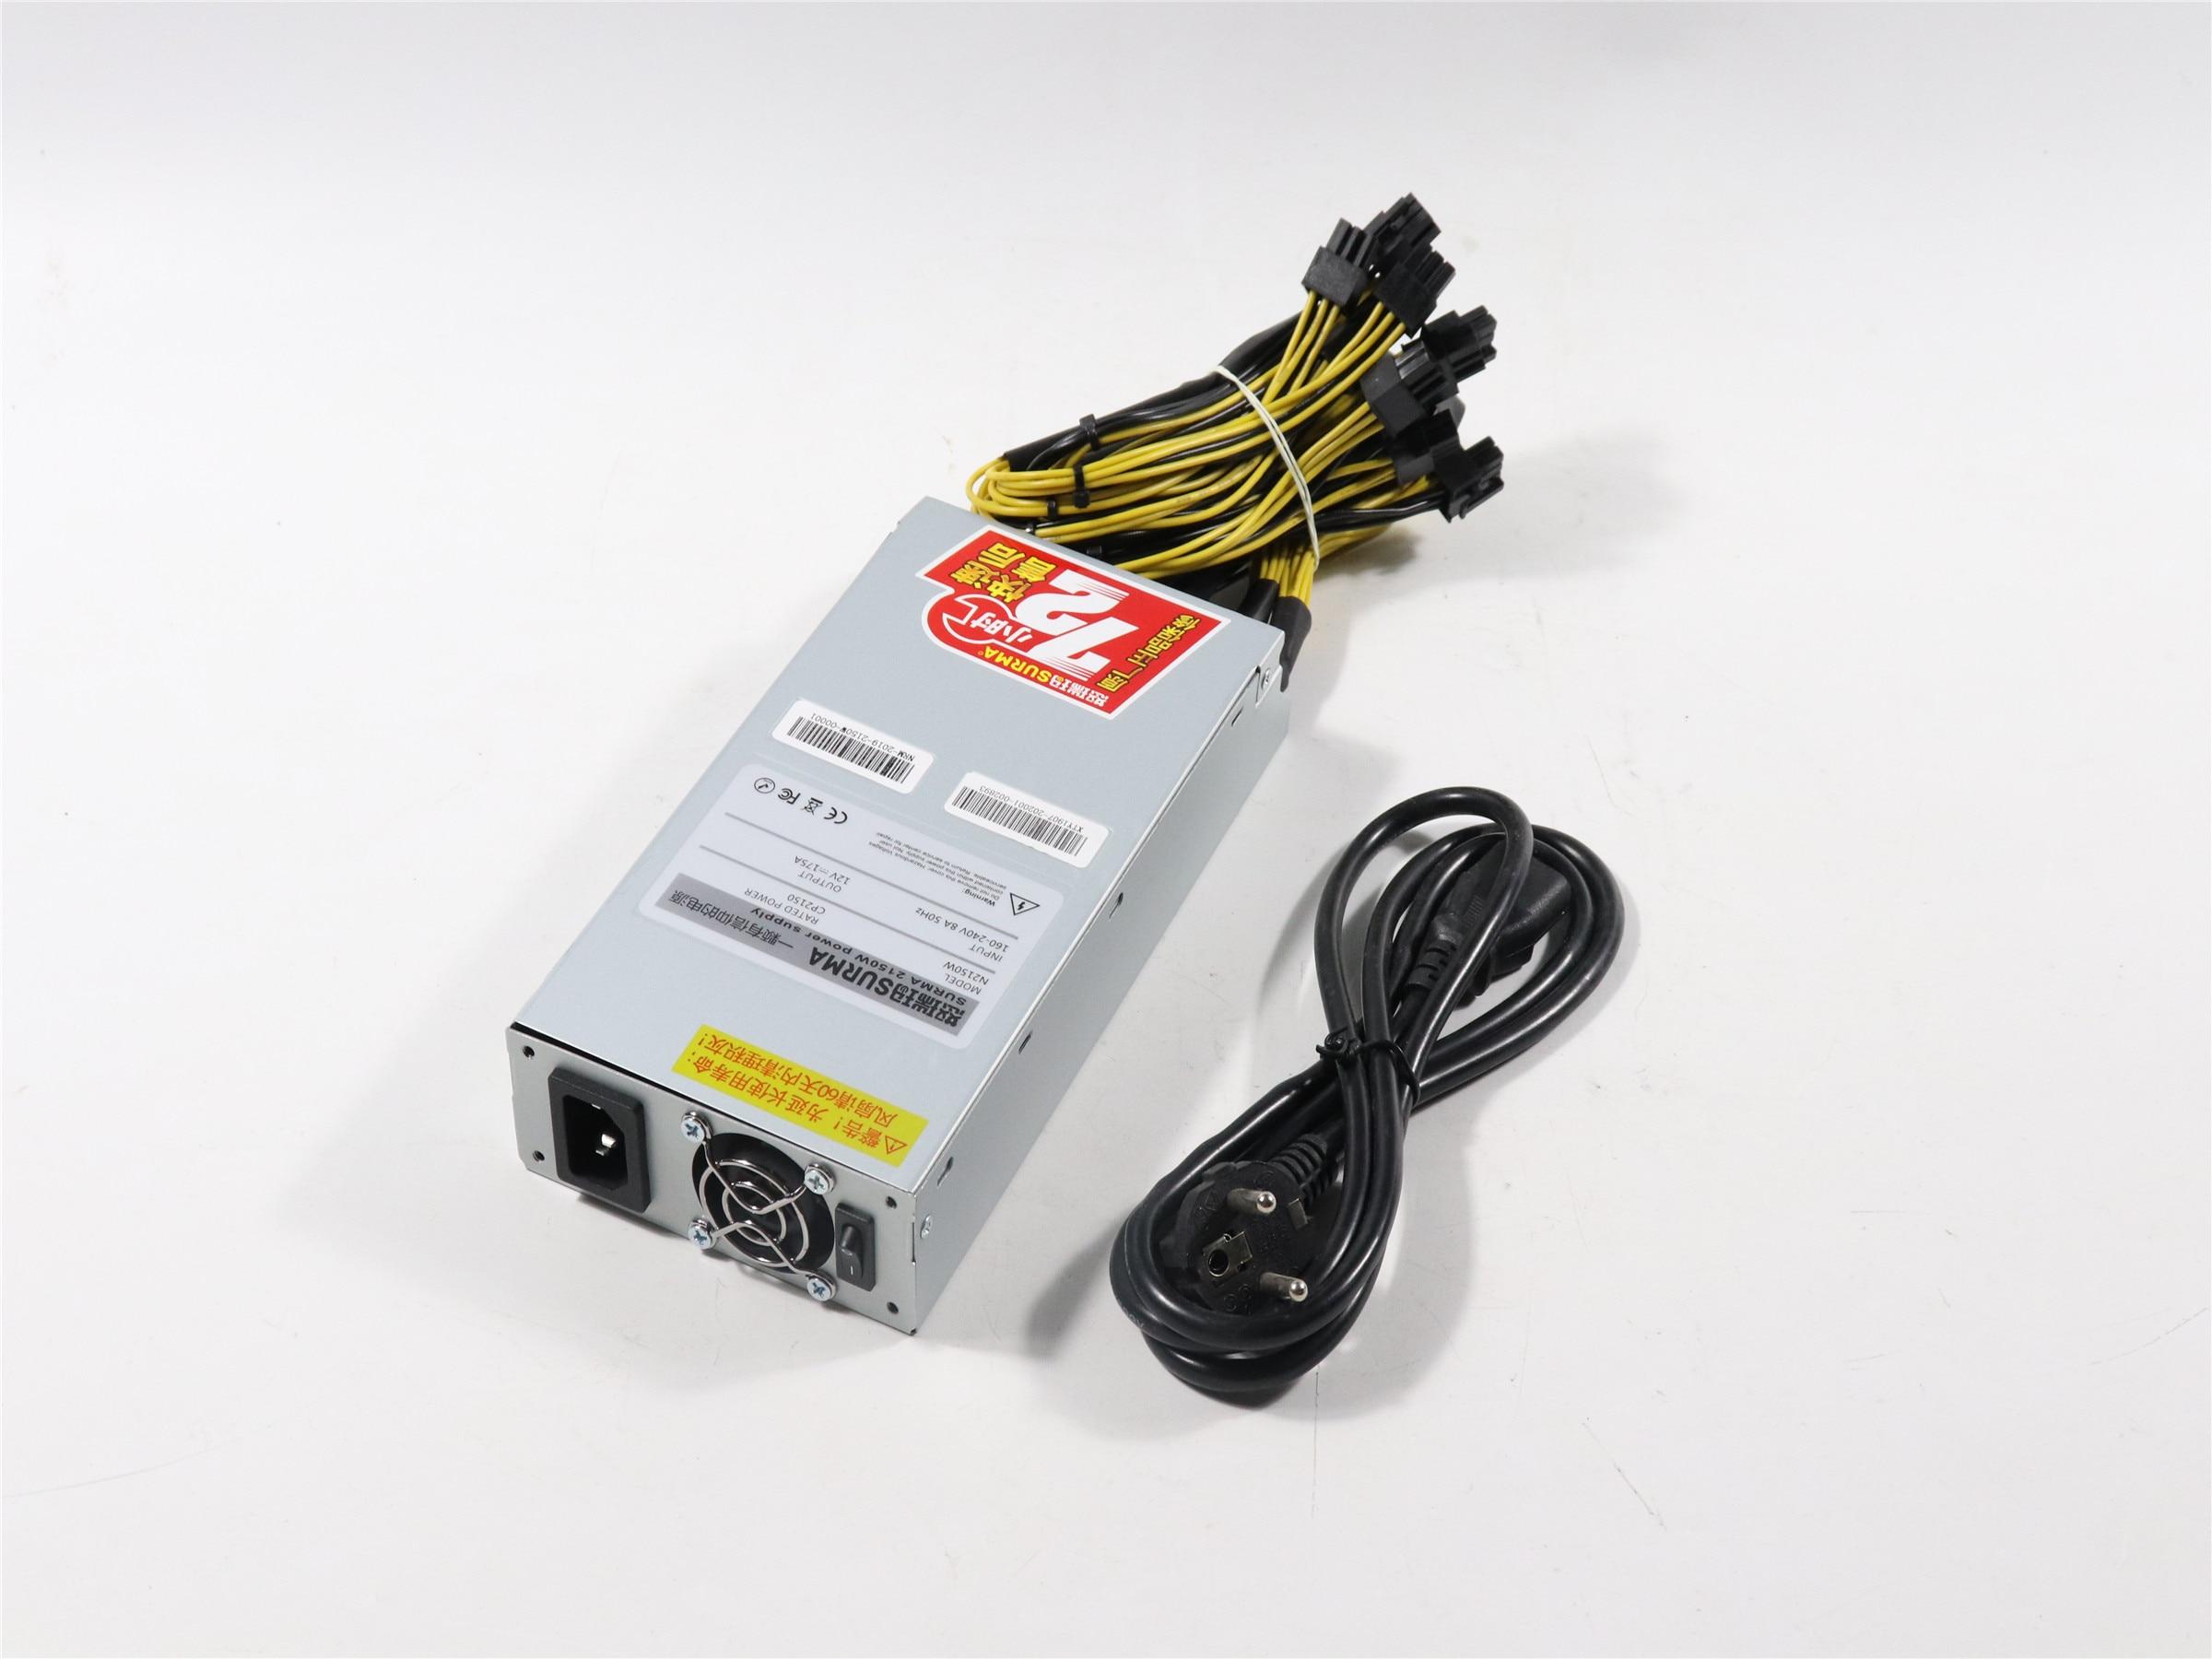 New ZEC BTC LTC DASH Miner PSU 2150W Power Supply For Antminer S9 S9j S9k S9 SE L3+ E3 Z9 Z11 T9 Innosilicon A9 Ebit E9i ETH PSU 1